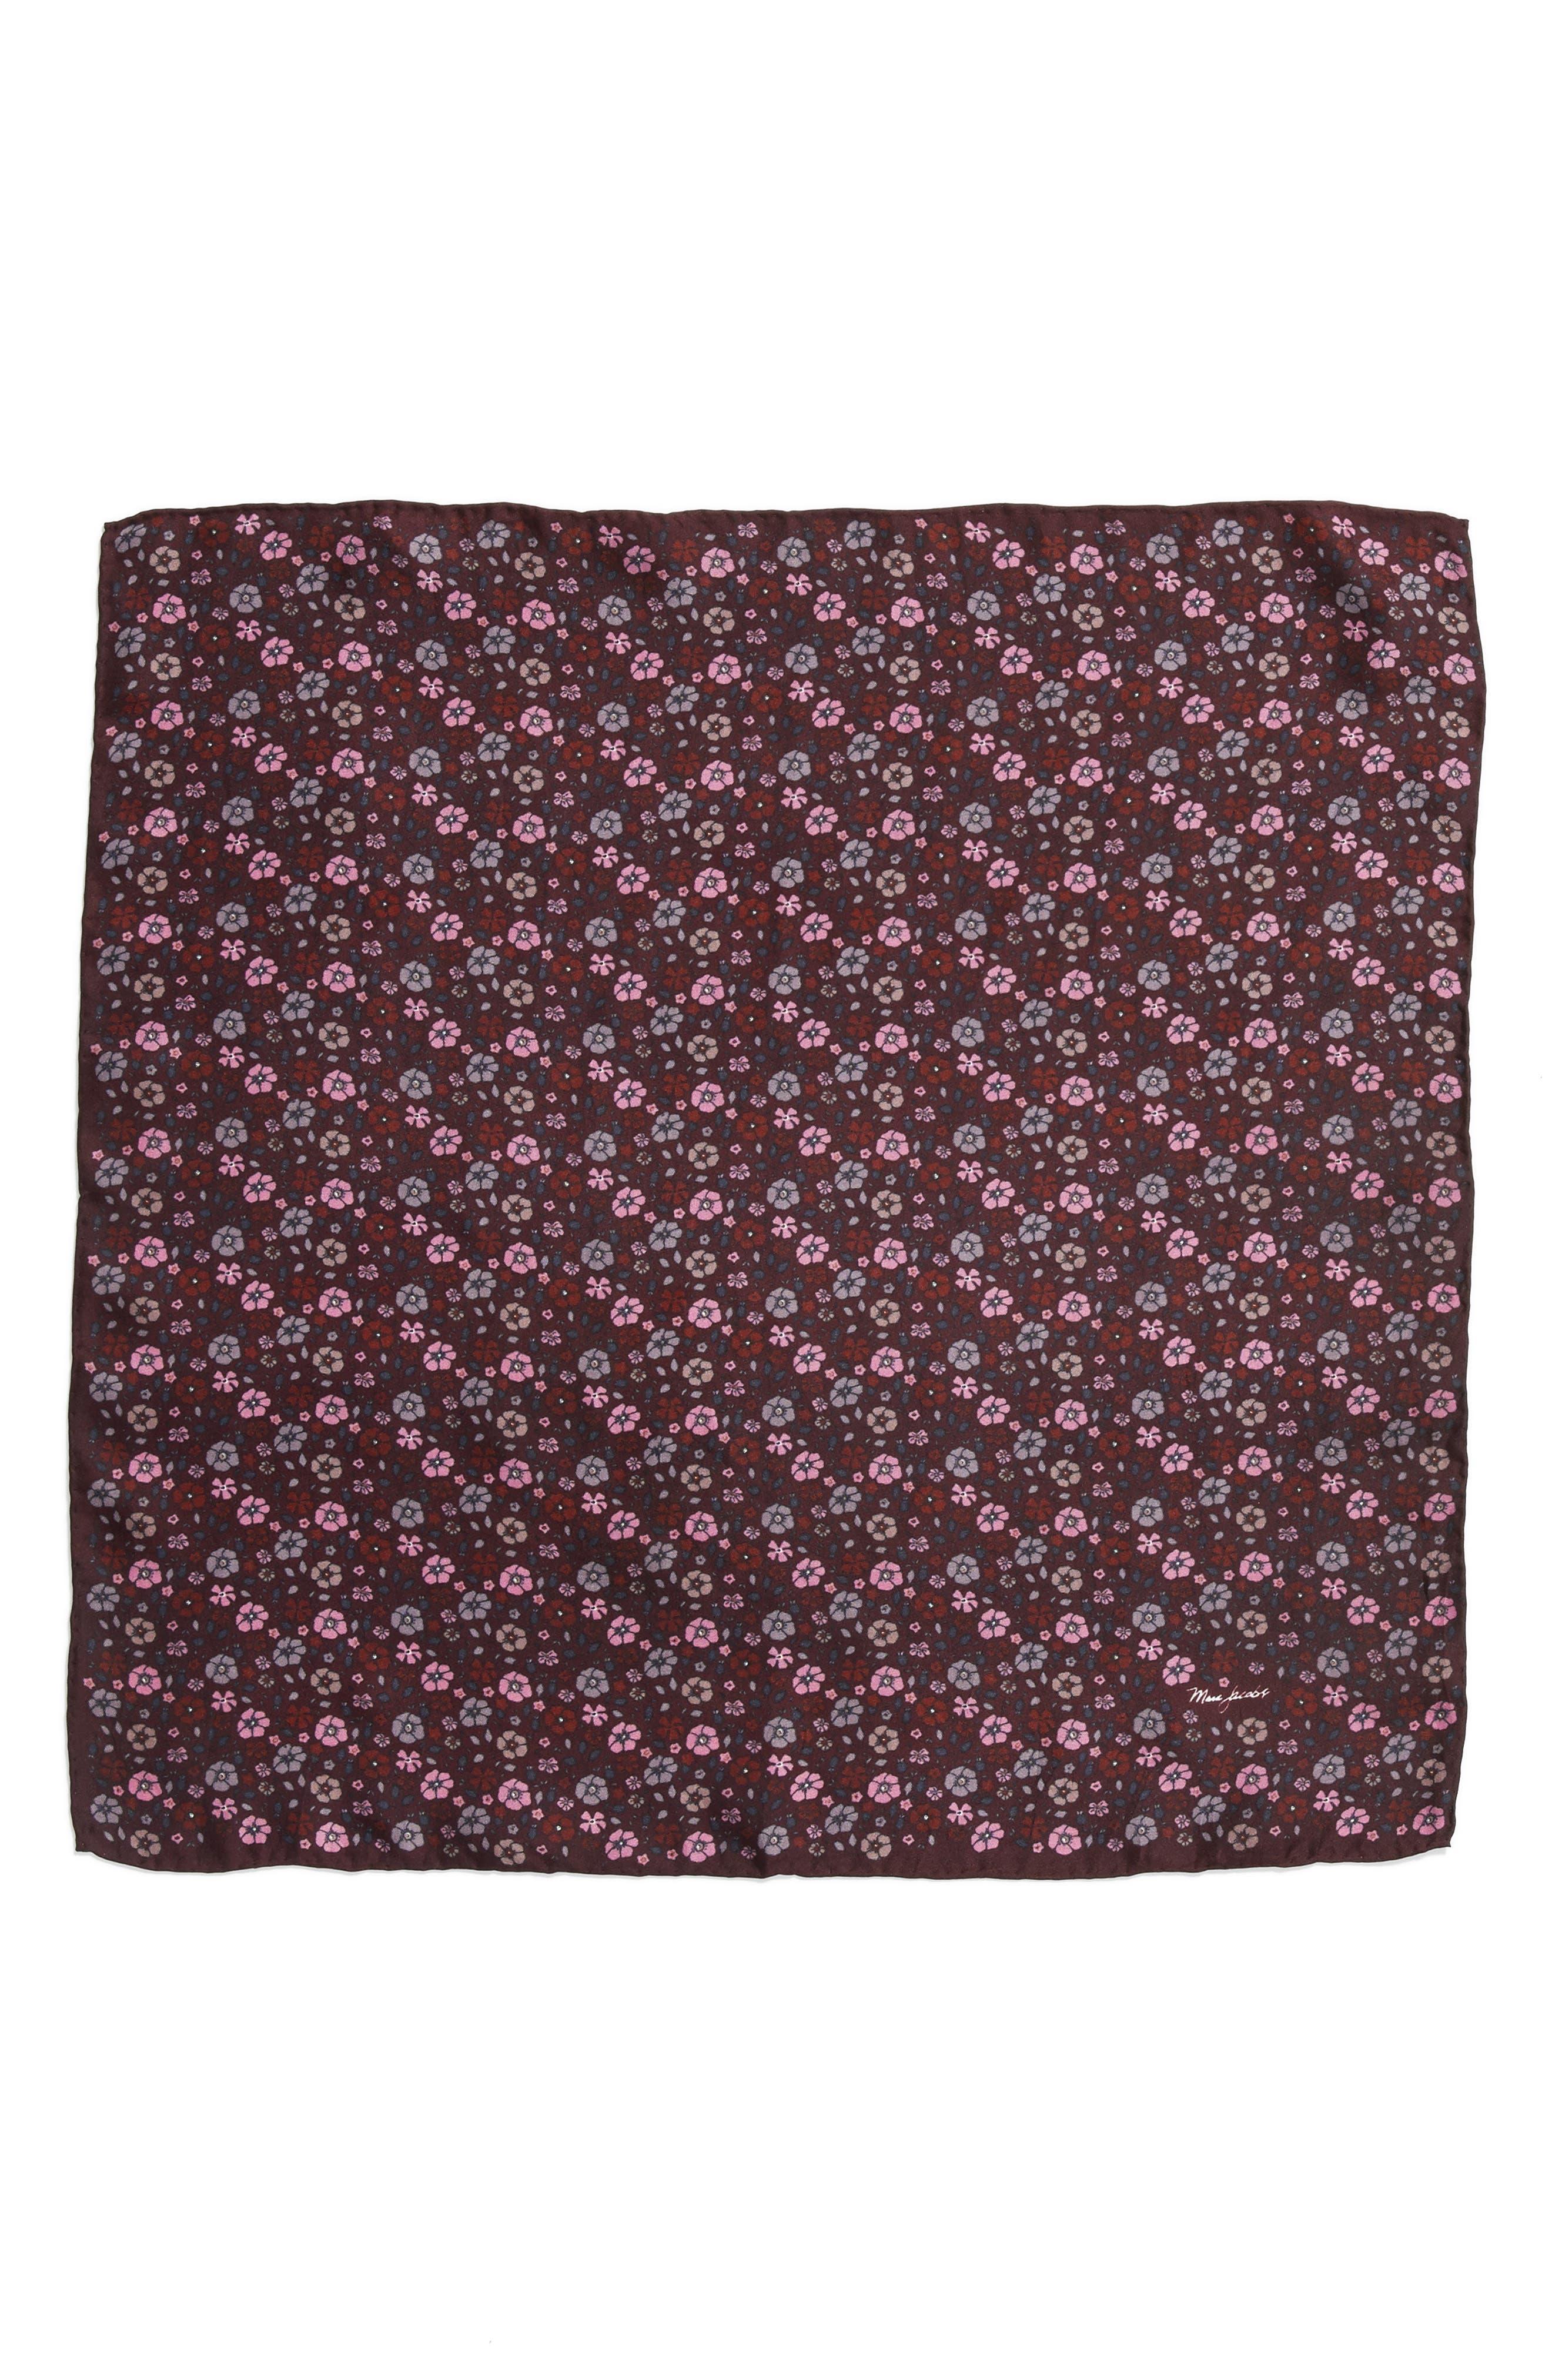 Floral Silk Bandana,                         Main,                         color, Maroon Multi